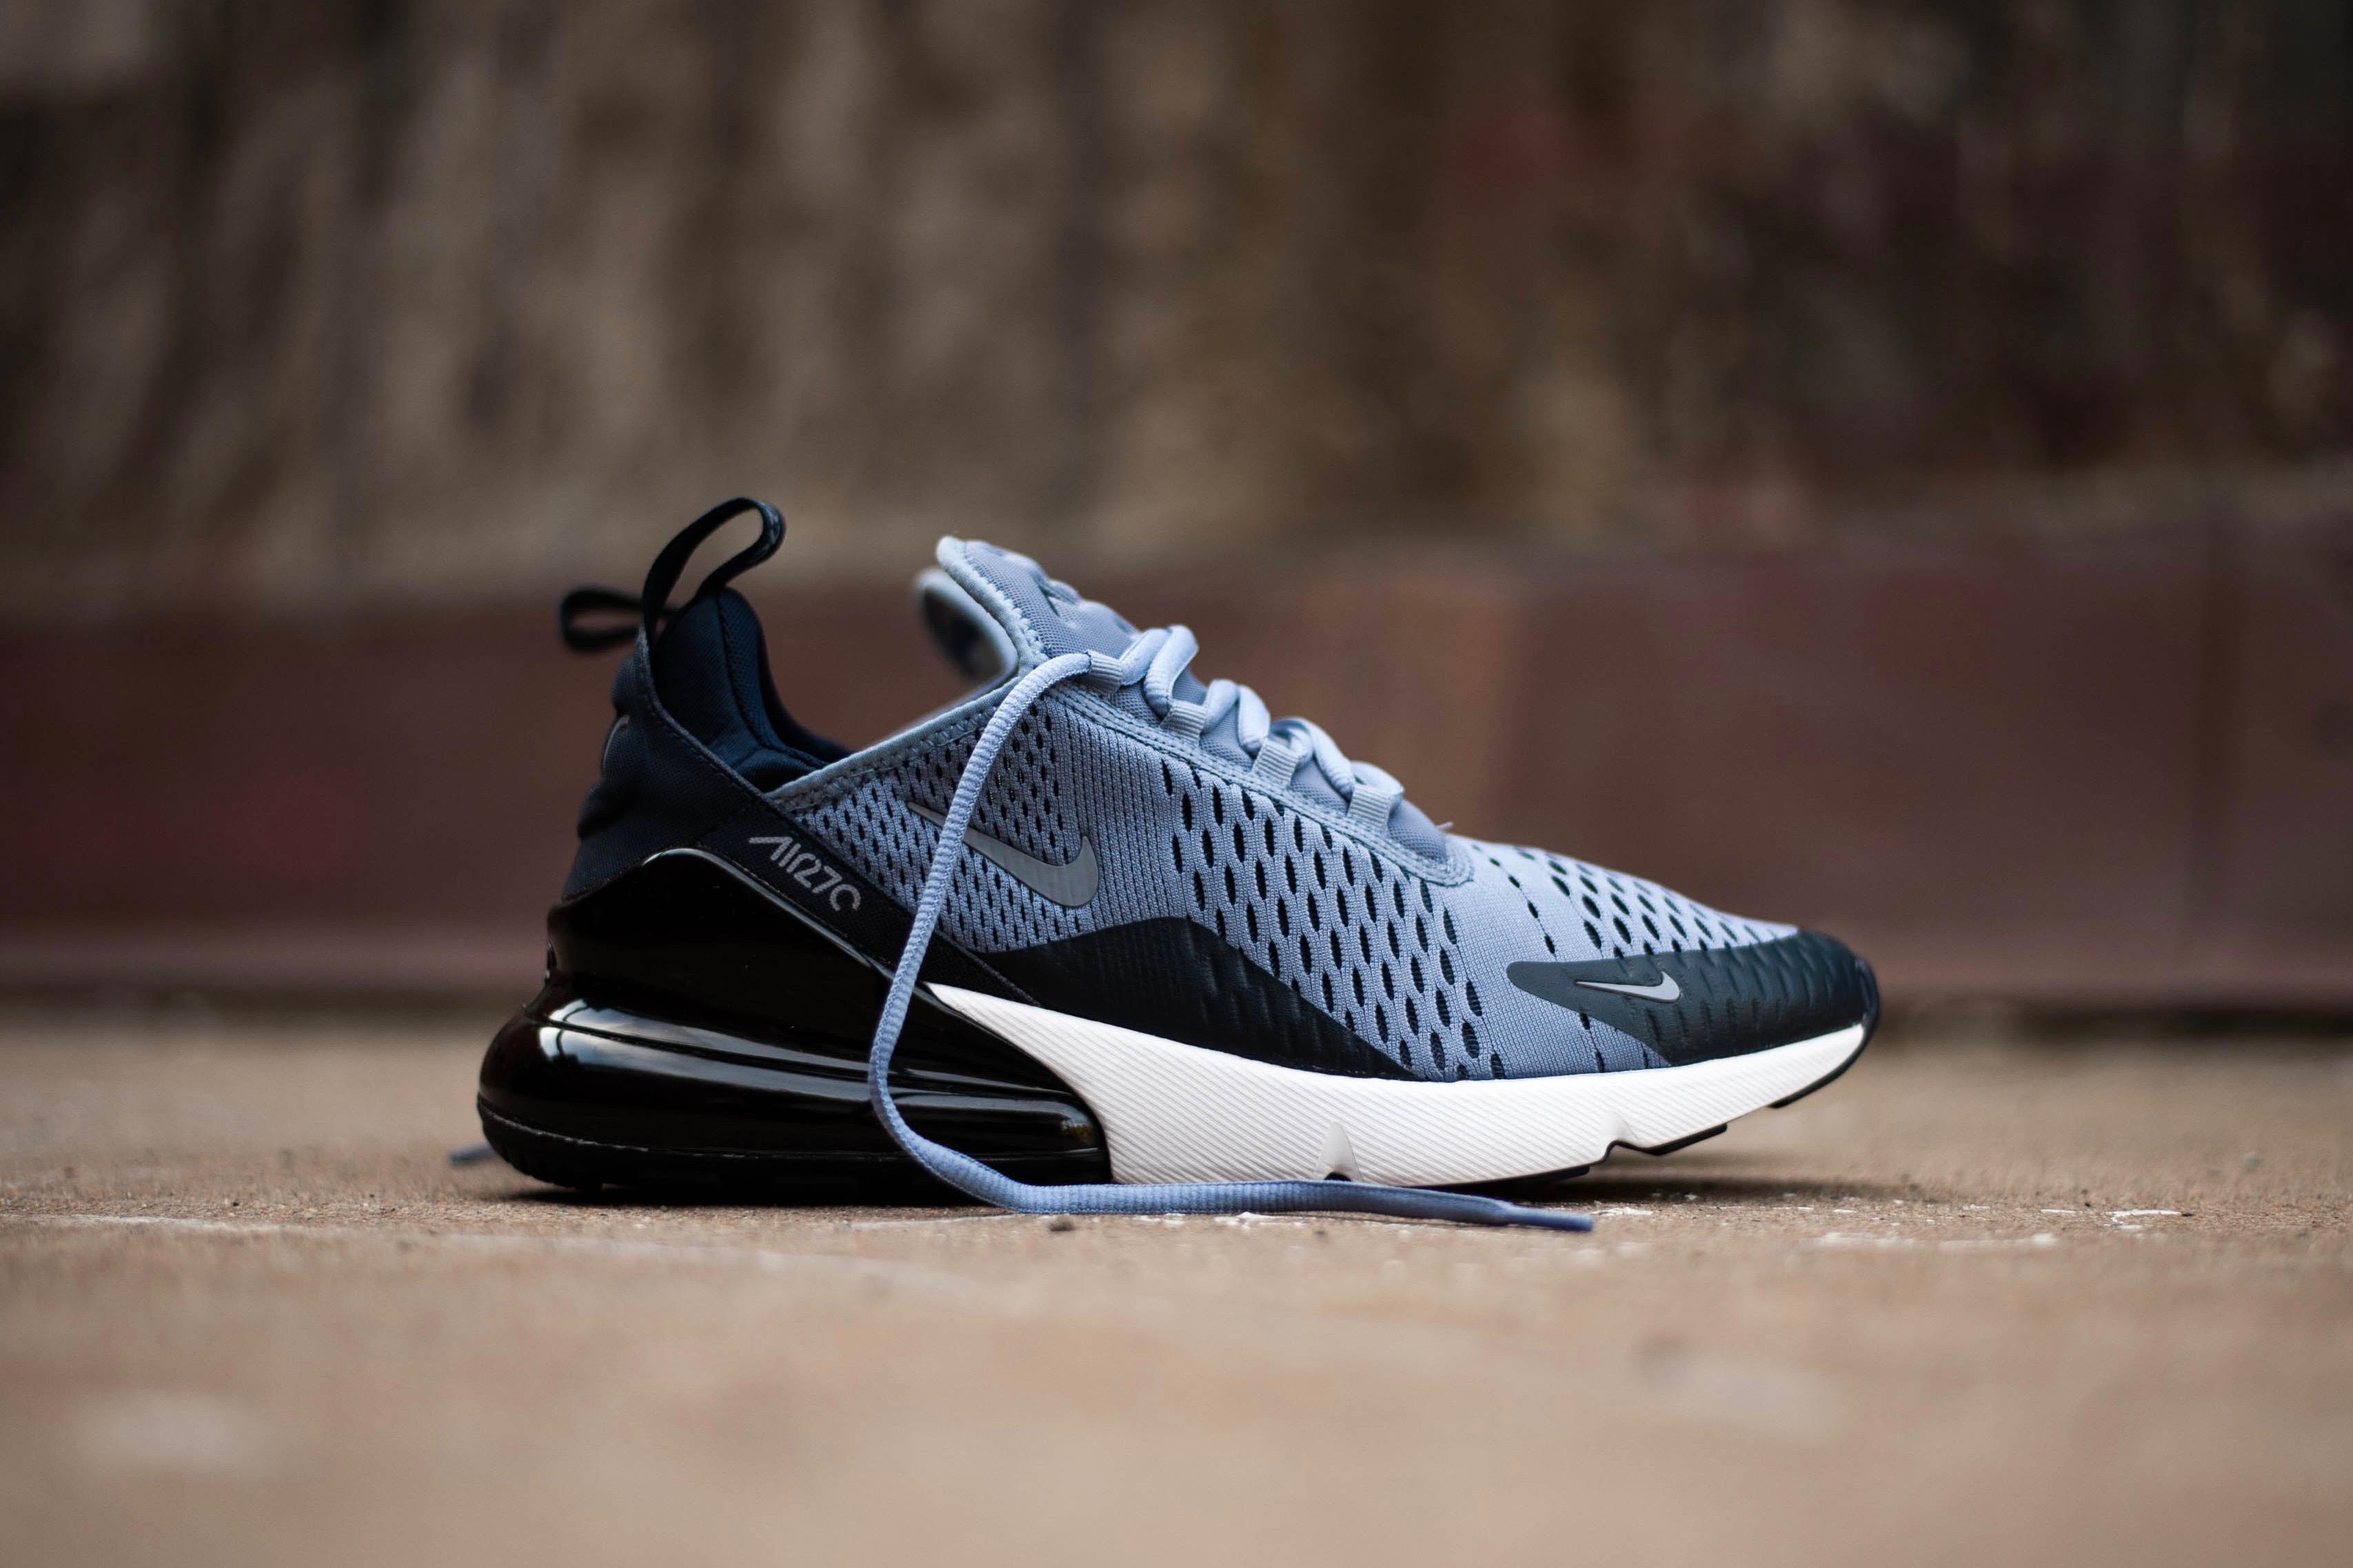 f50d526825 Nike Air Max 270 – Ashen Slate / Black / Dark Obsidian – STASP